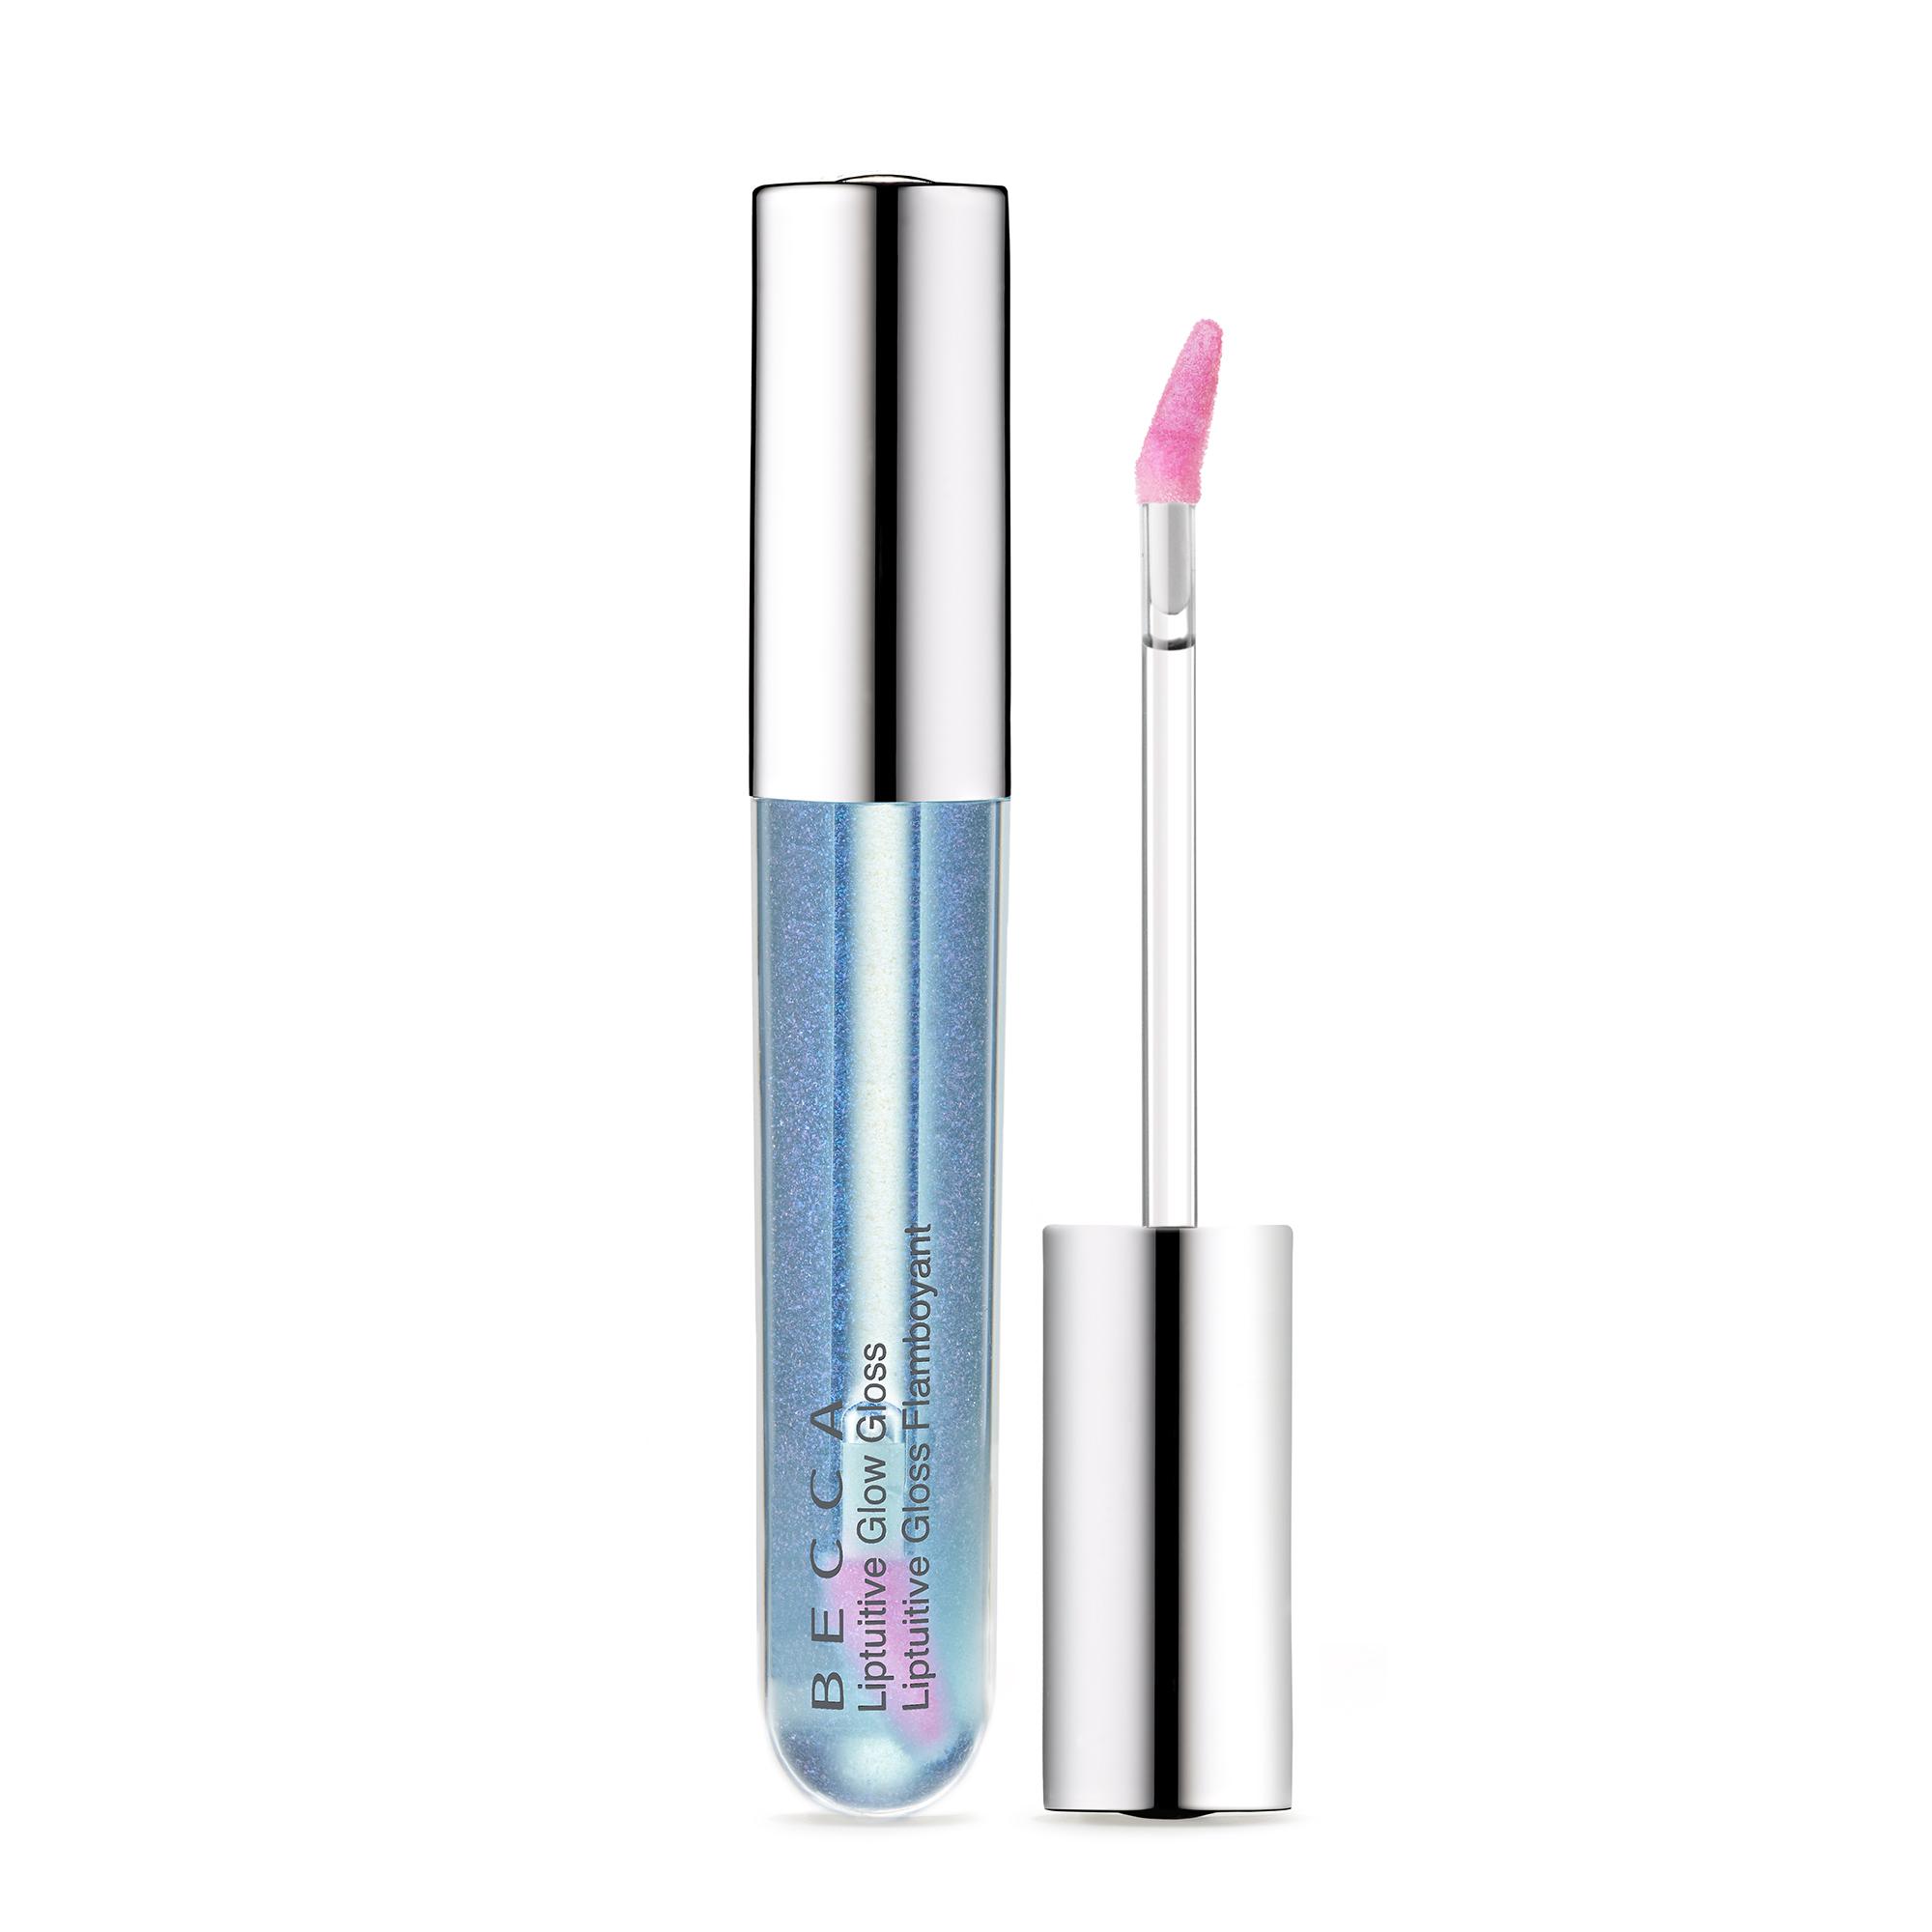 Liptuitive Lip Gloss - AED 114